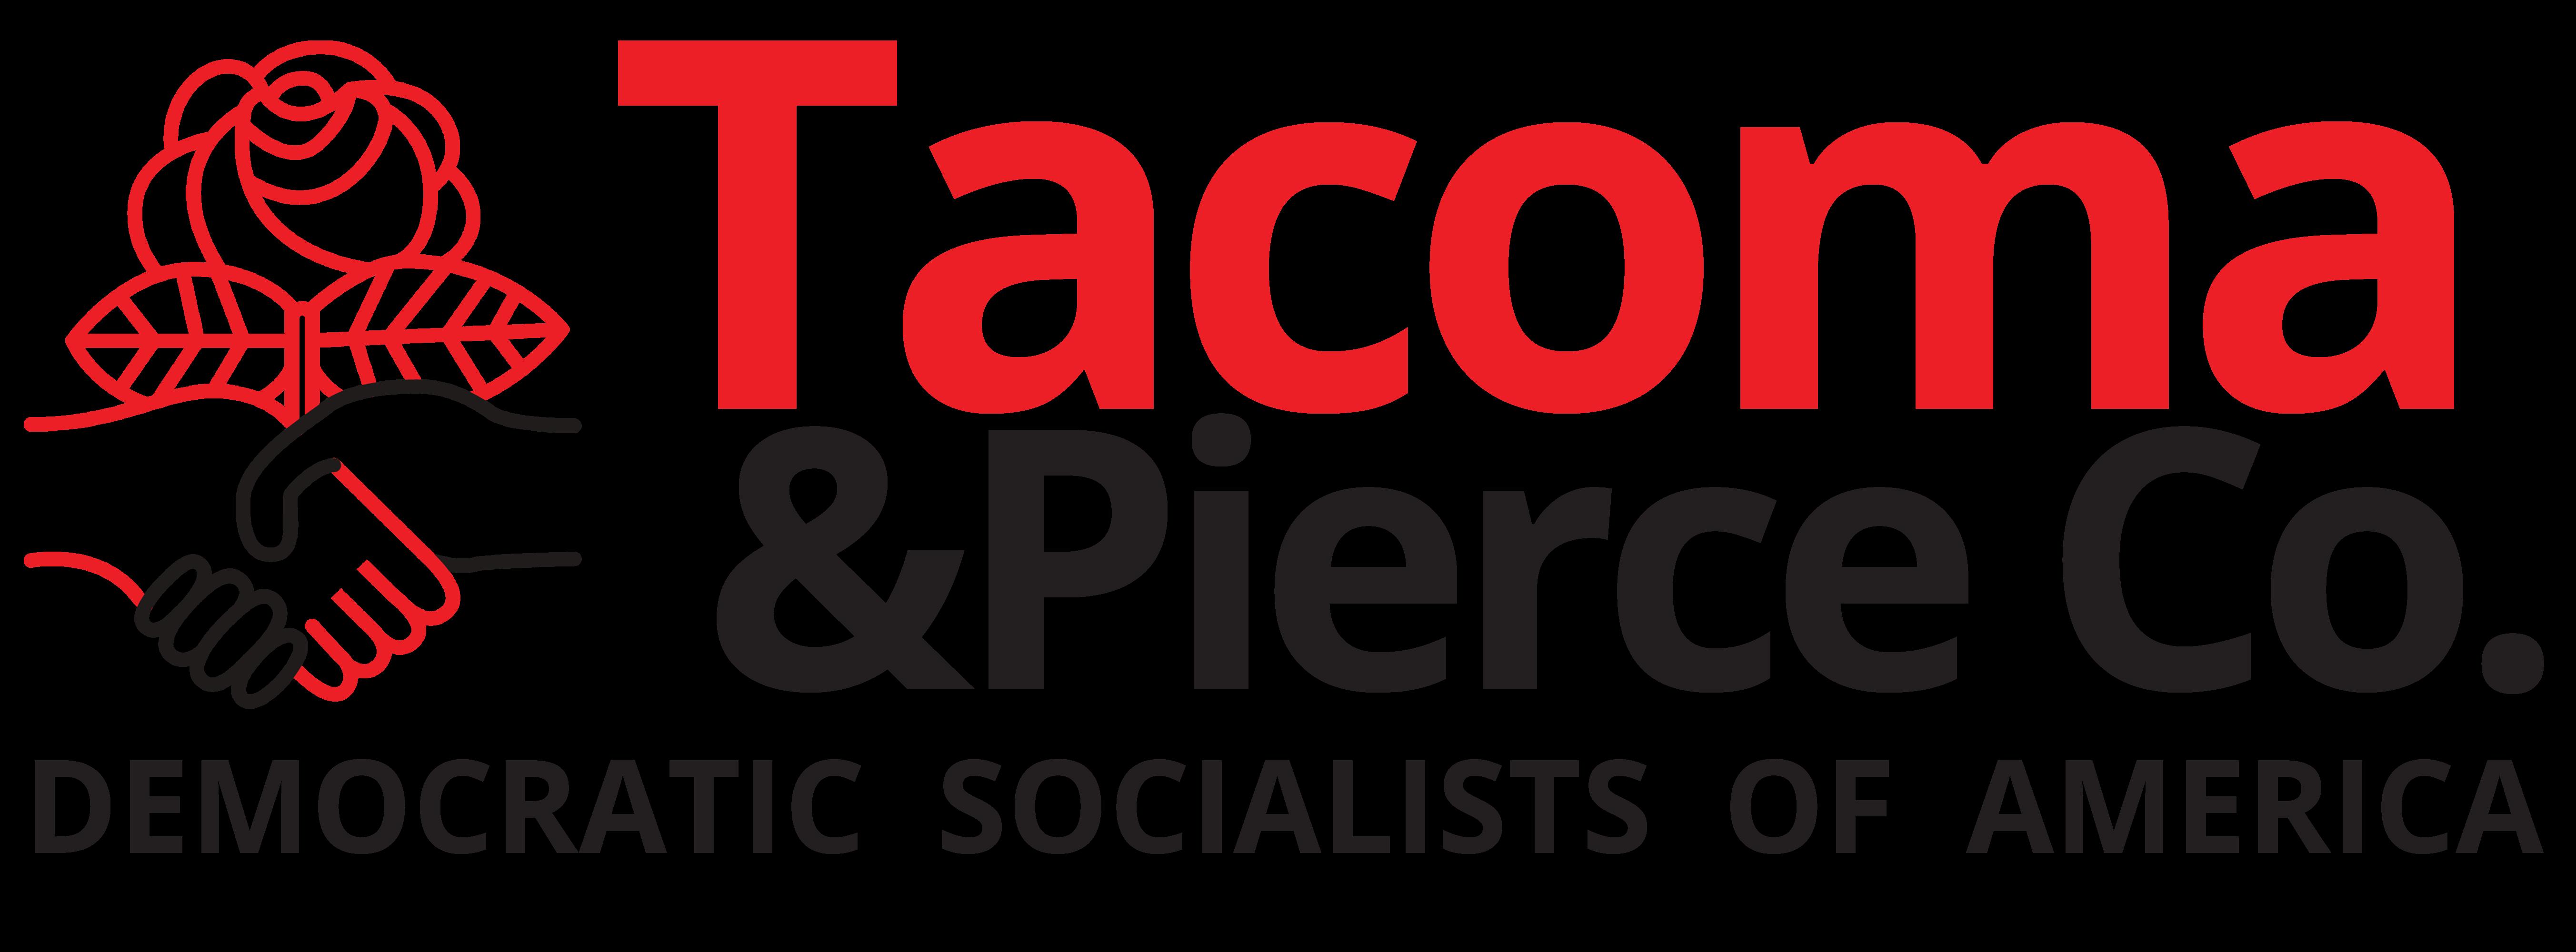 Tacoma Democratic Socialists of America